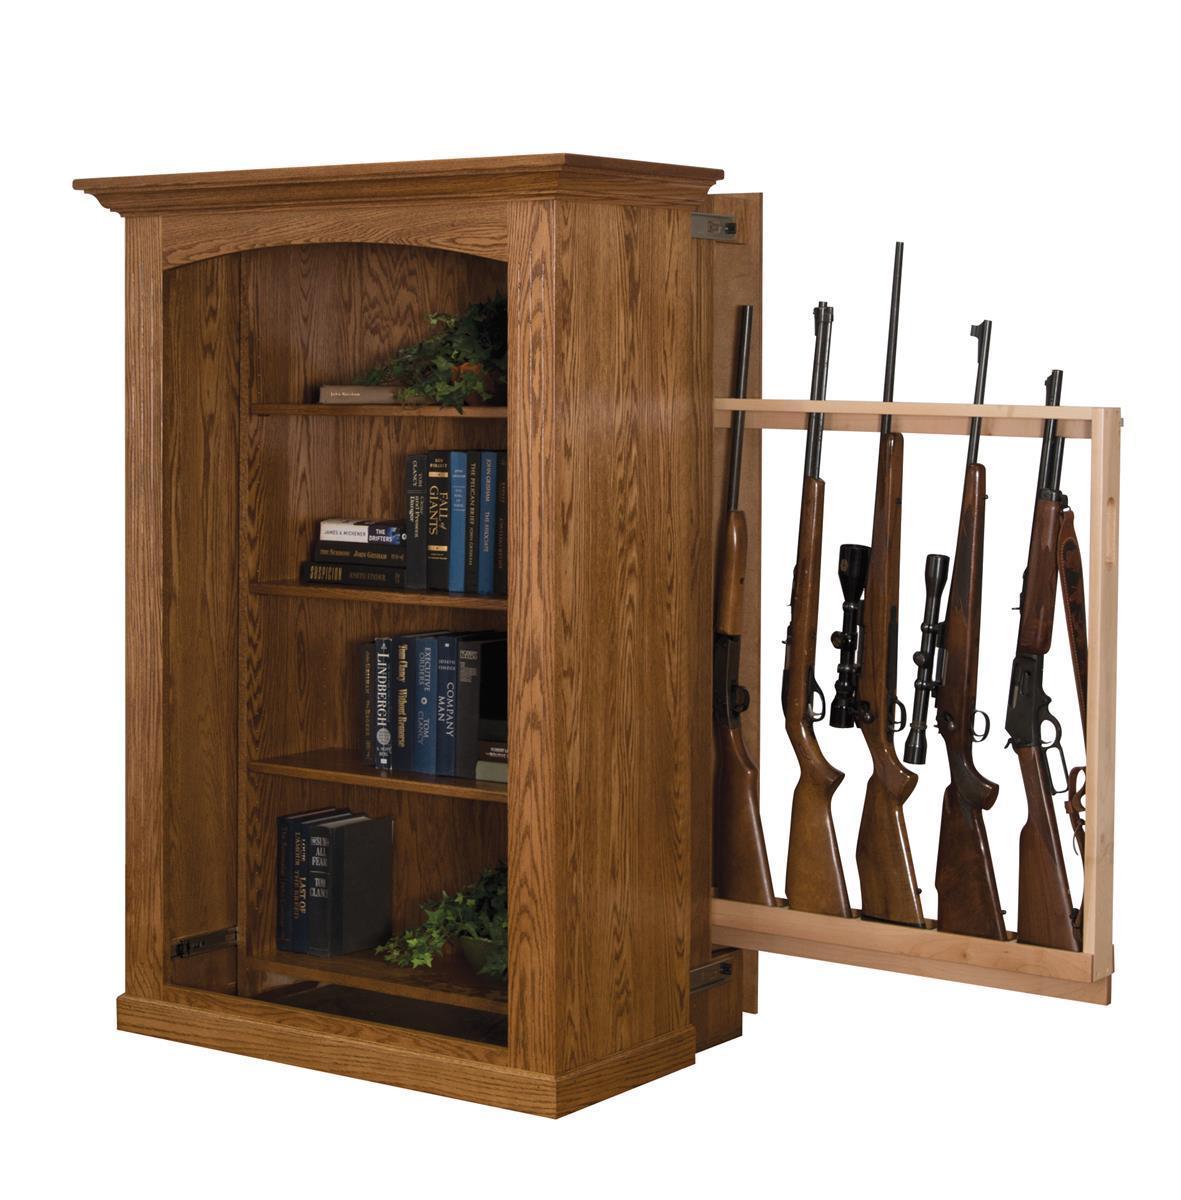 Small Bookcase With Hidden Gun Cabinet